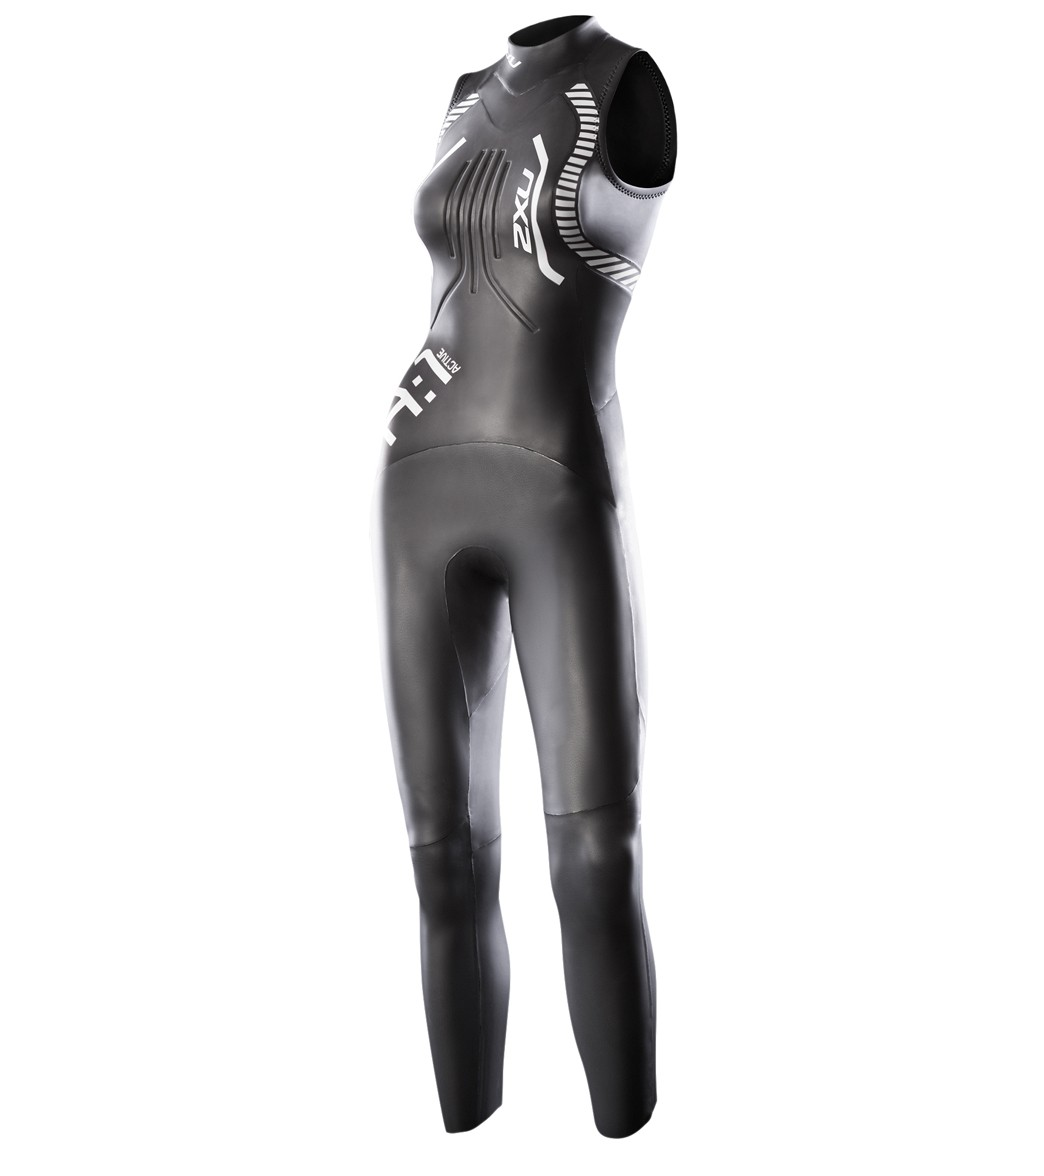 3cbaa4383f 2XU Women s A 1 Active Sleeveless Triathlon Wetsuit